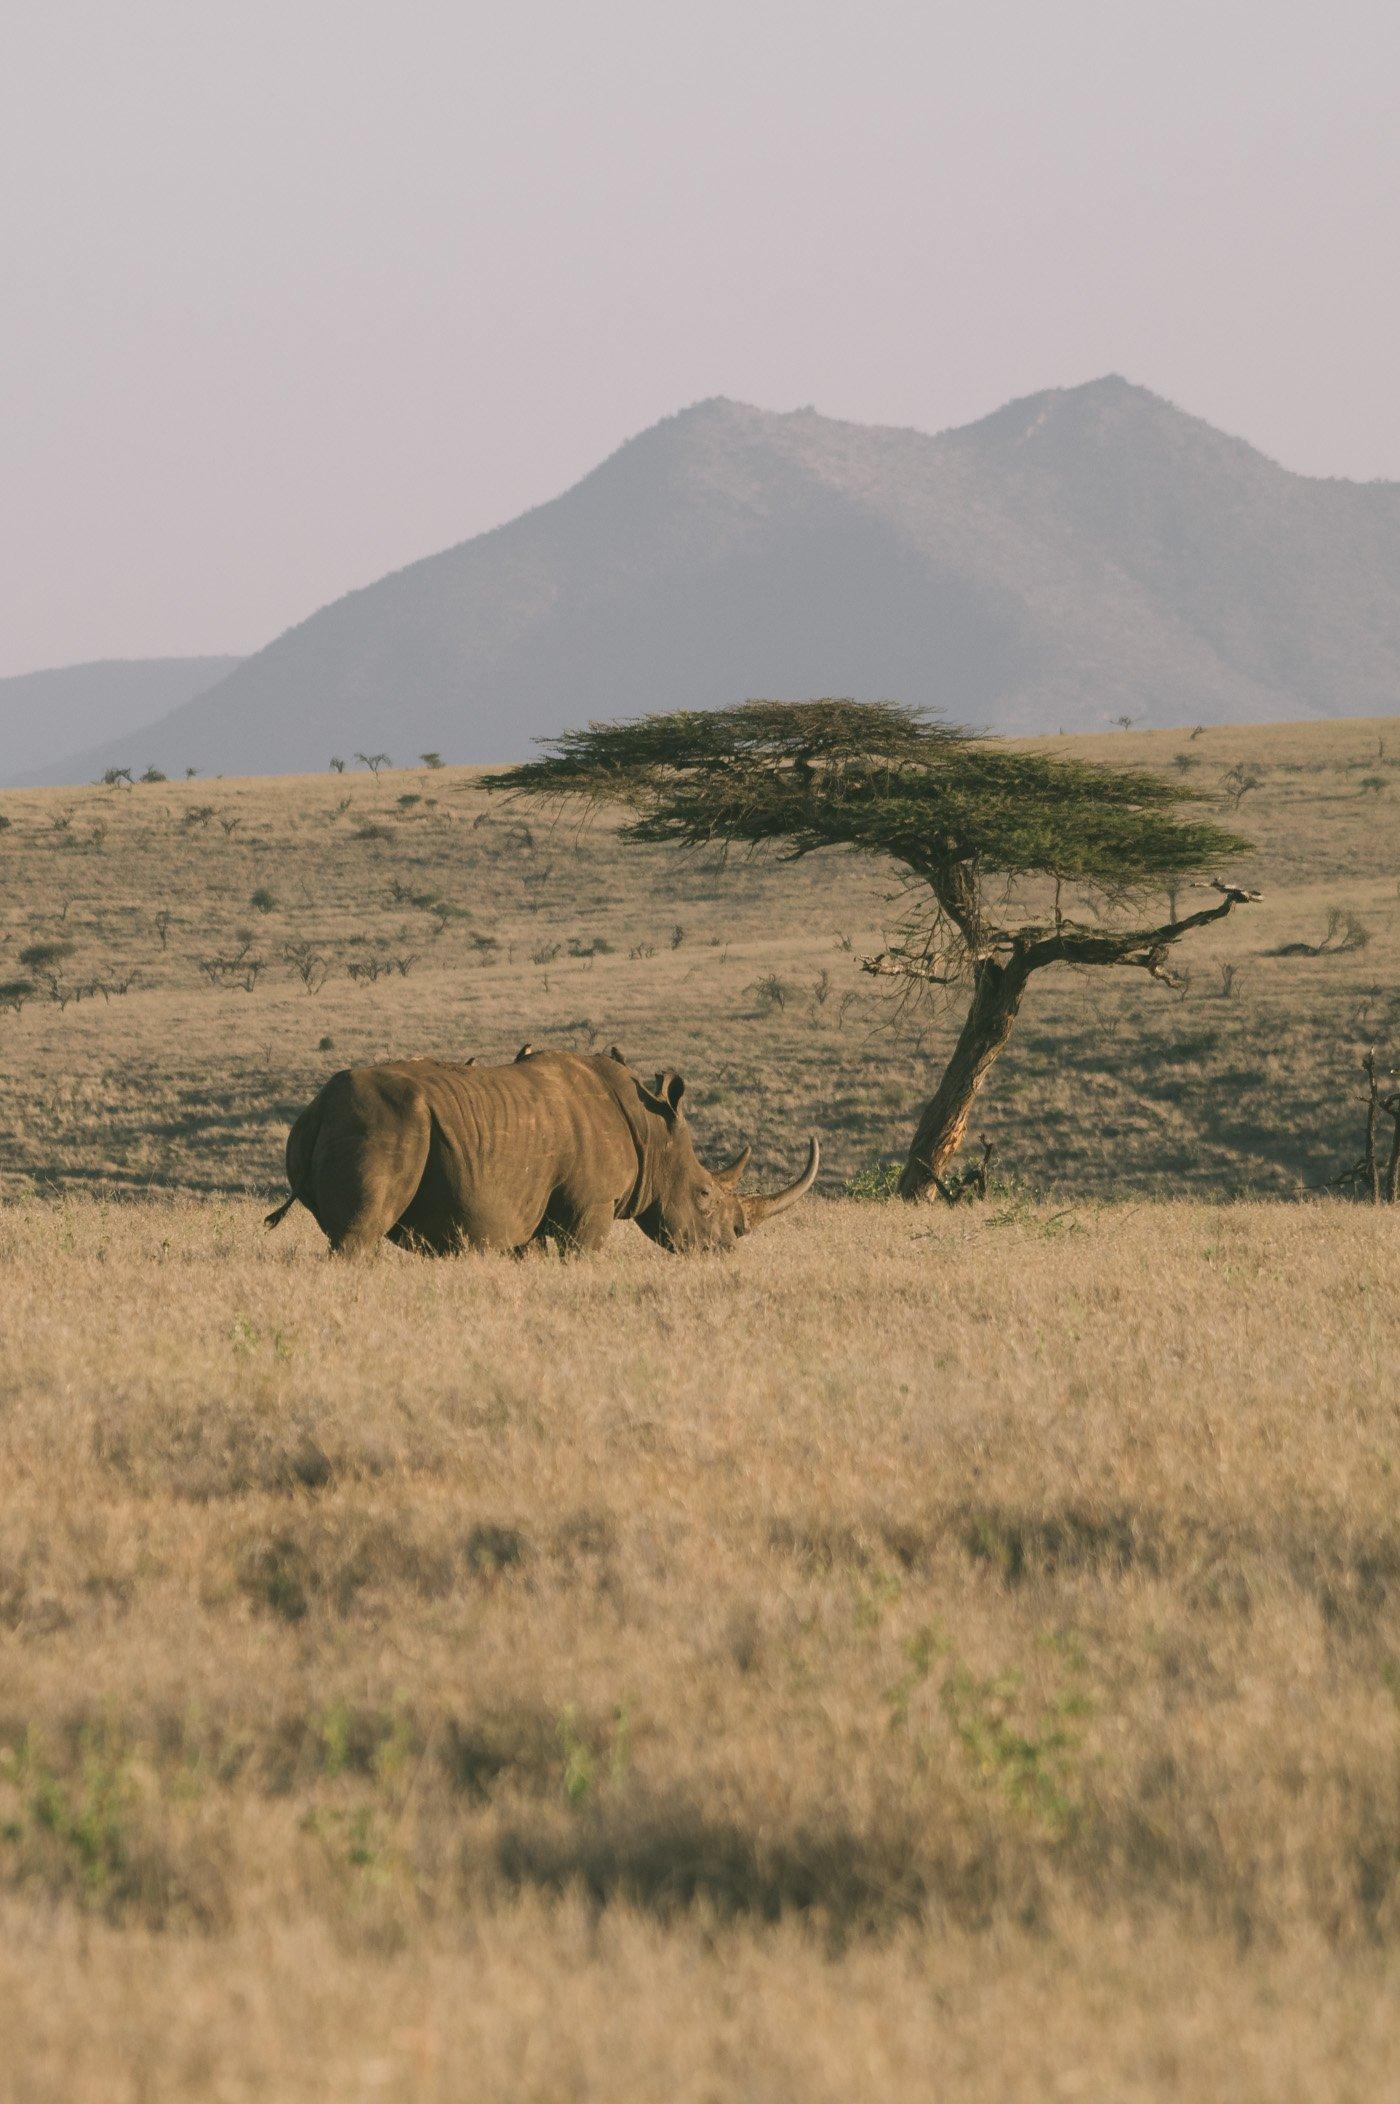 Rhino at Lewa Conservancy Kenya